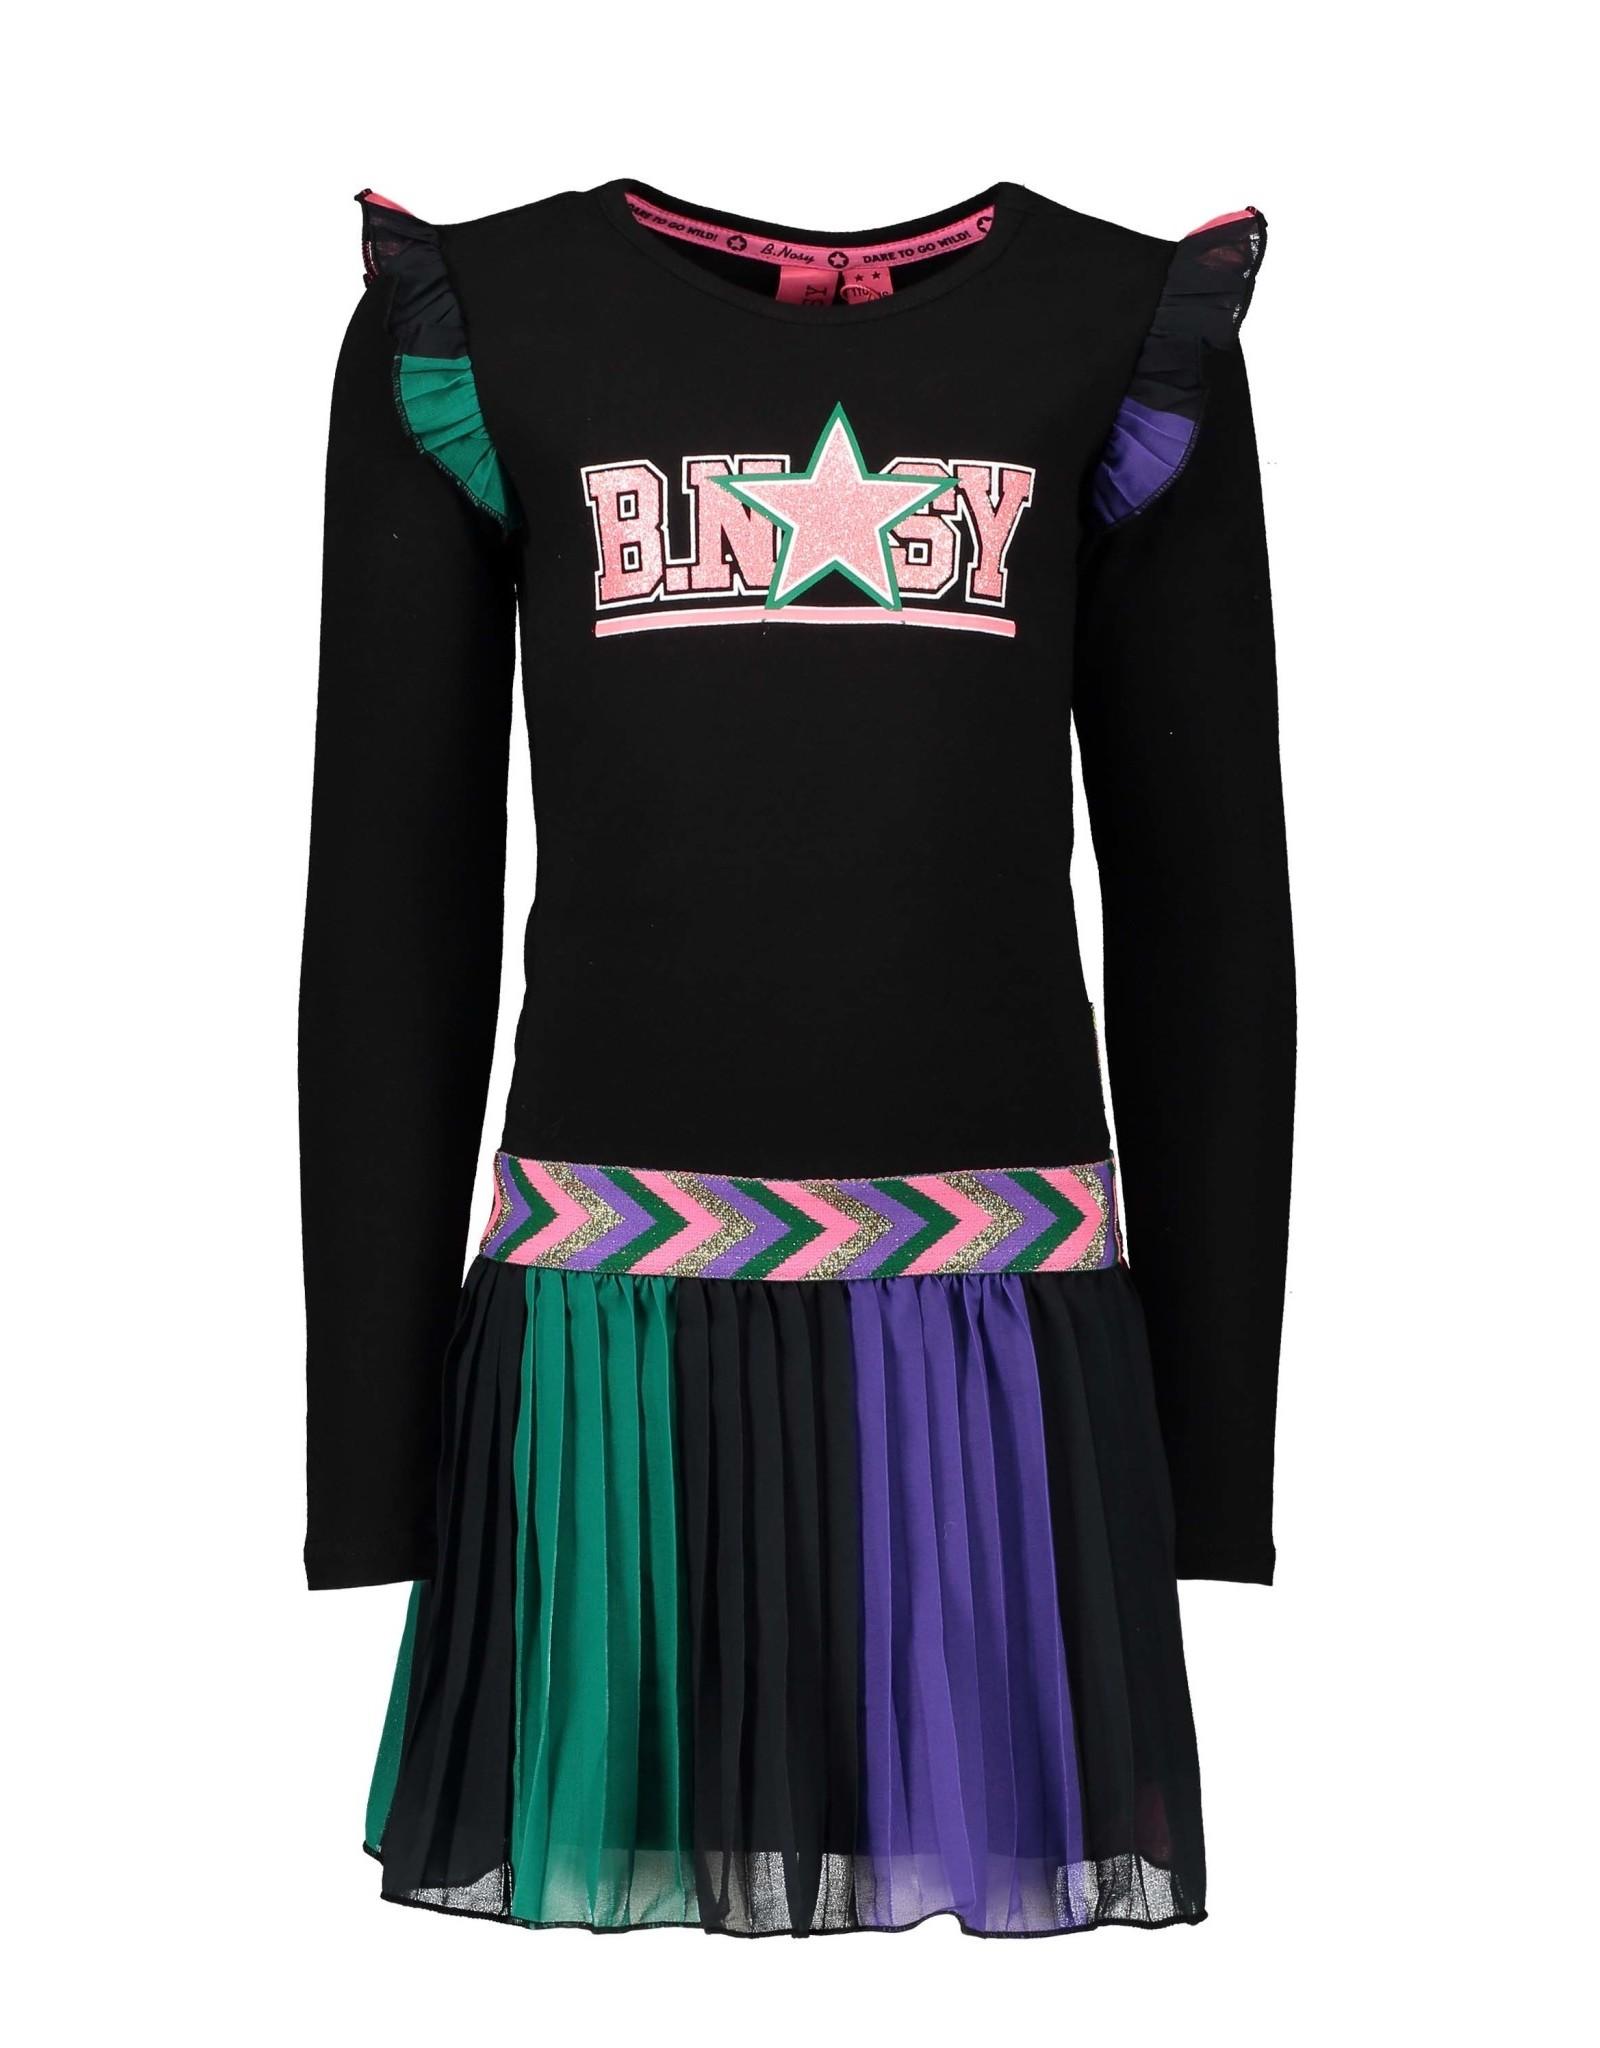 B.Nosy B.Nosy meisjejs jurk met geweven verticale geprinte streeprok